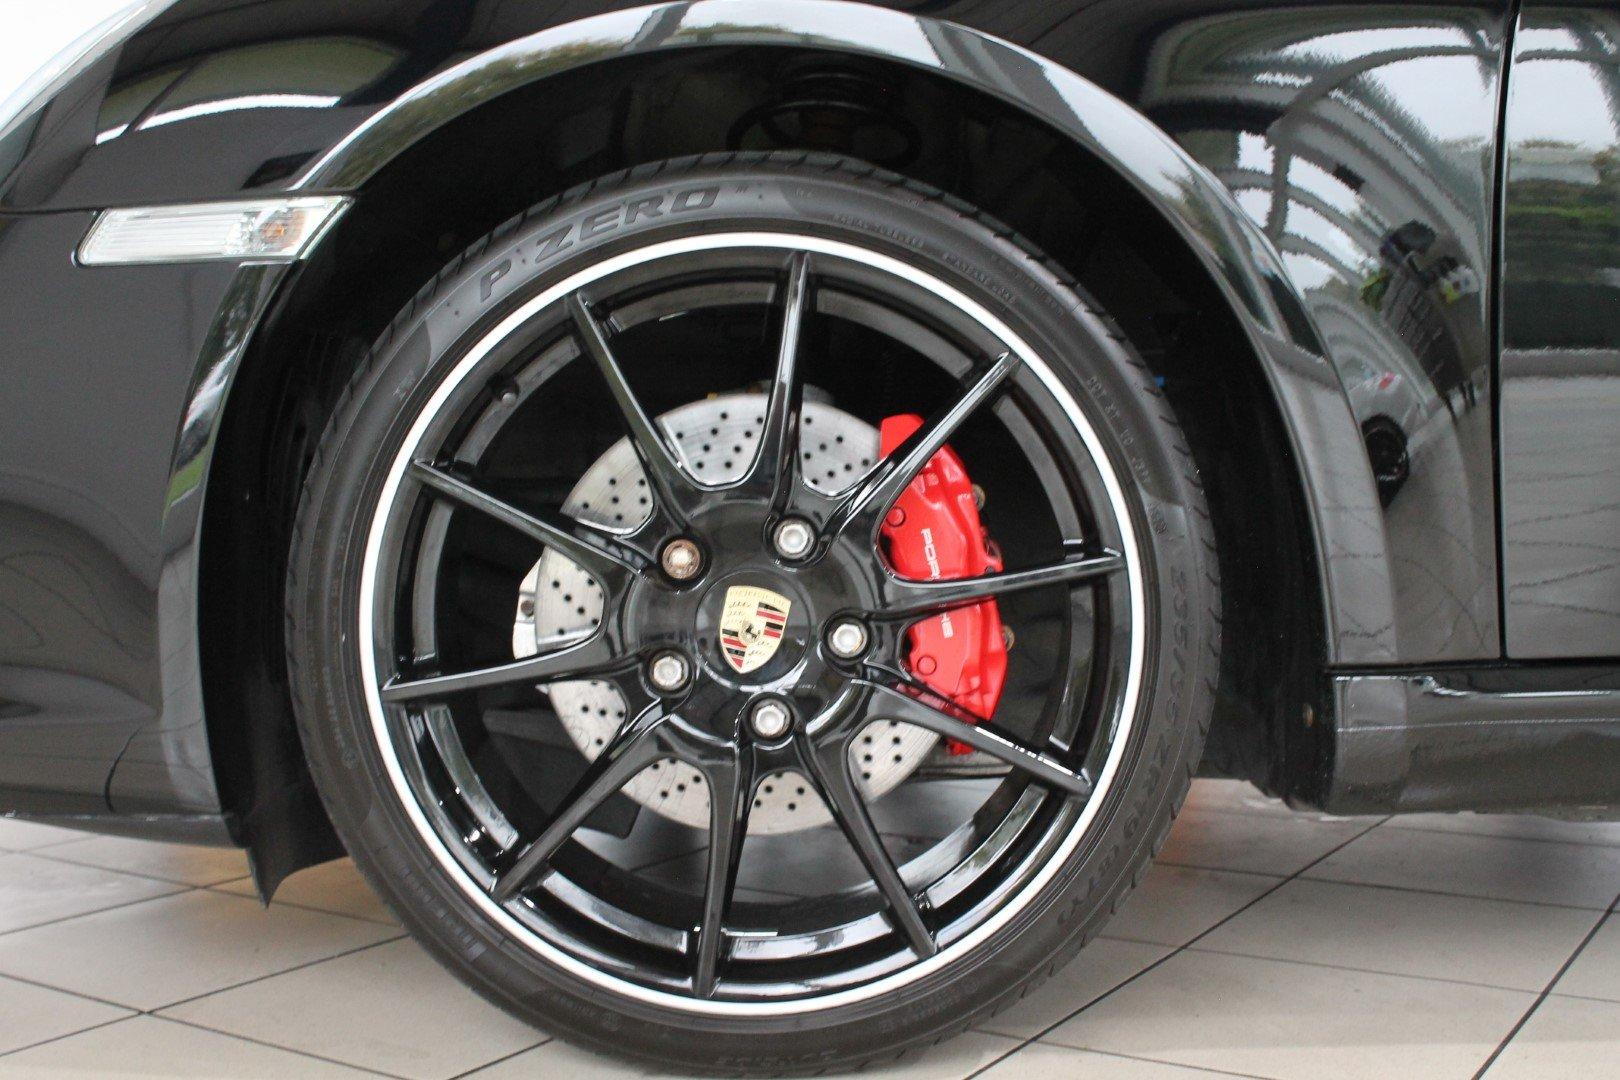 2011 Porsche Boxster (987) 3.4 S Black Edition Manual For Sale (picture 12 of 12)